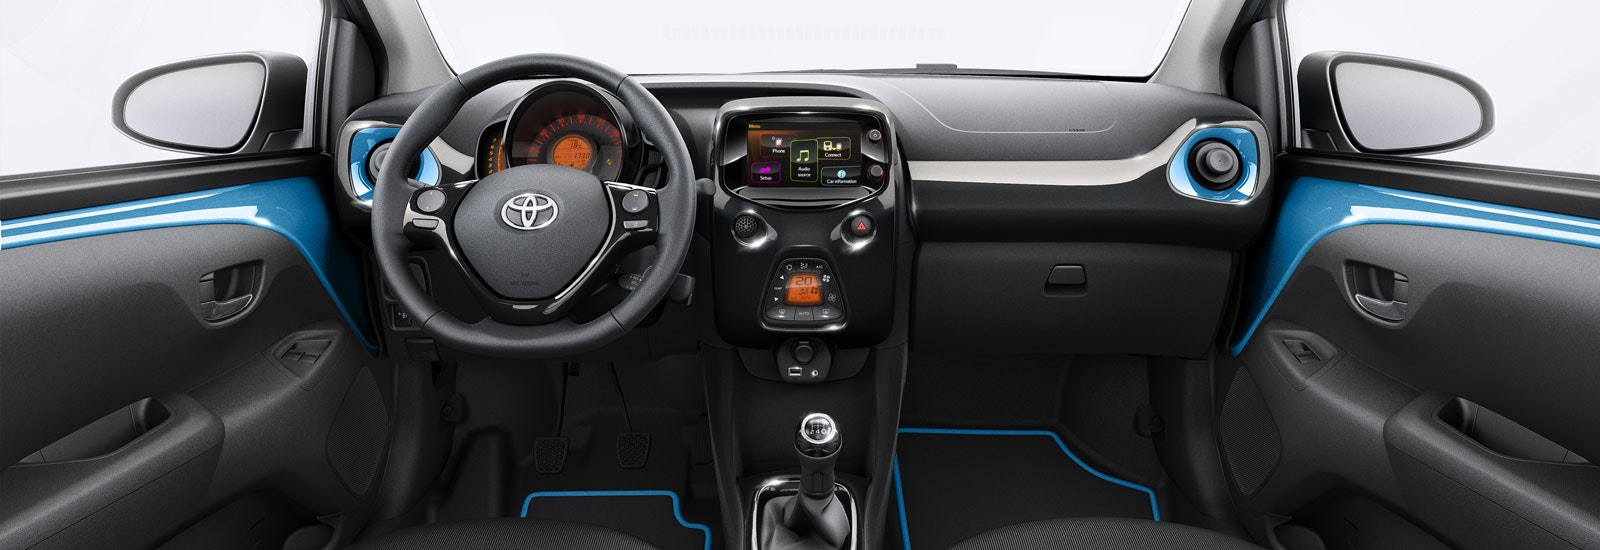 Toyota Aygo Interior 1989 Dakota Wiring Diagram Schematic Septic Tank Control Dodge Ram 2001 Stereo For Turn Signal